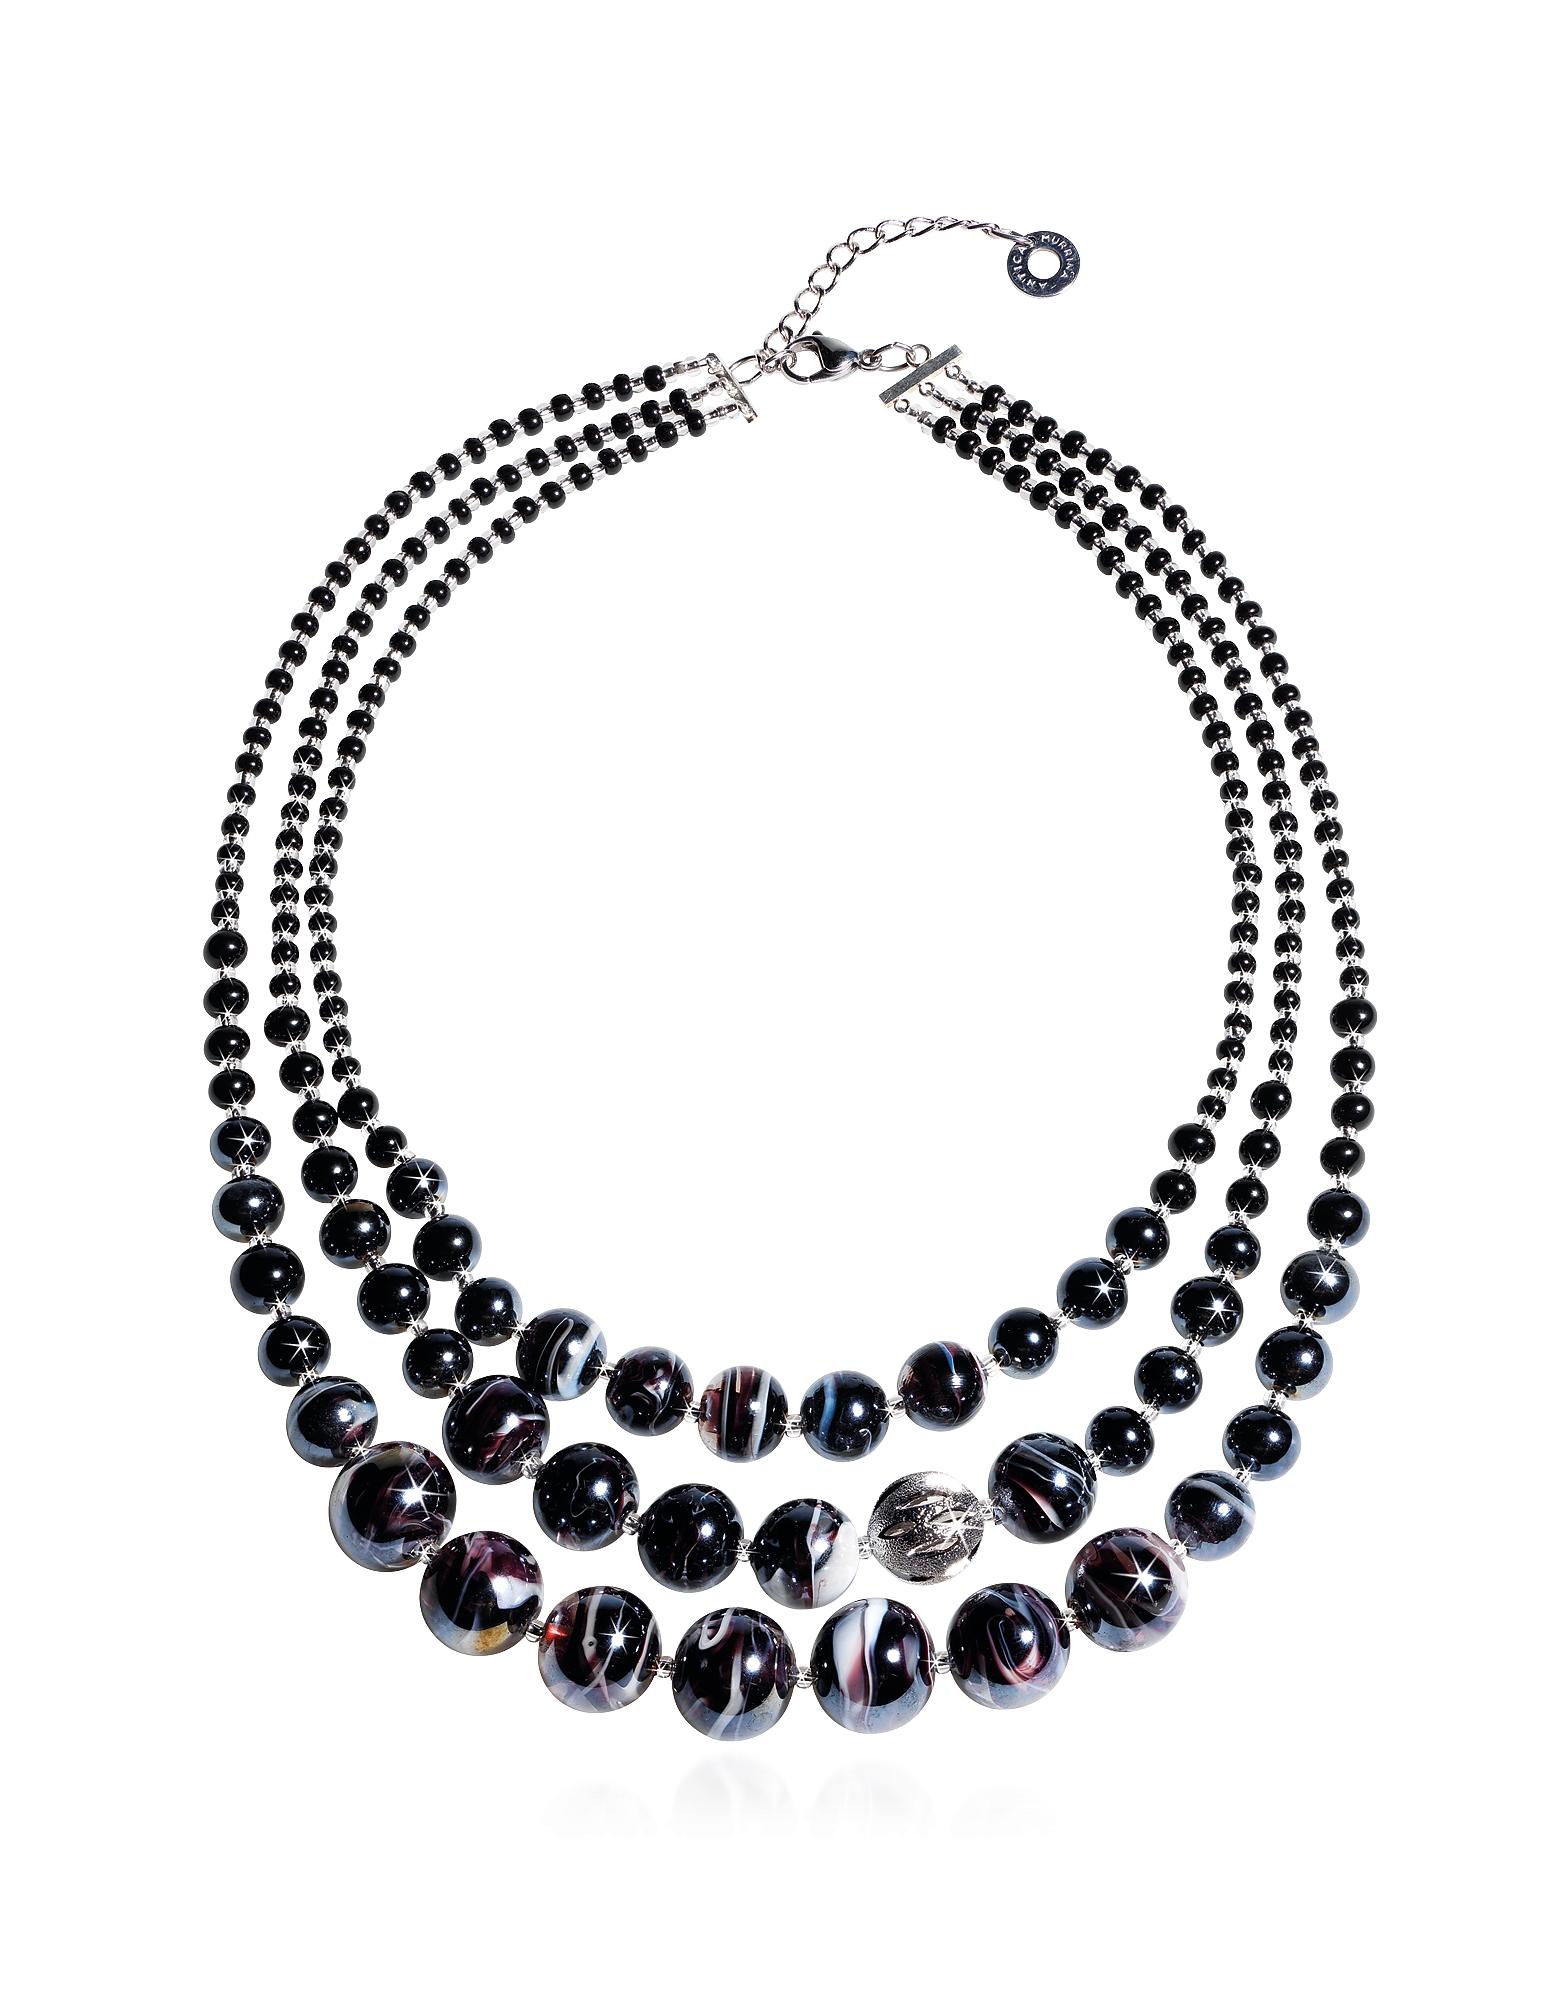 Antica Murrina Necklaces, Optical 1 Top - Black Murano Glass Choker